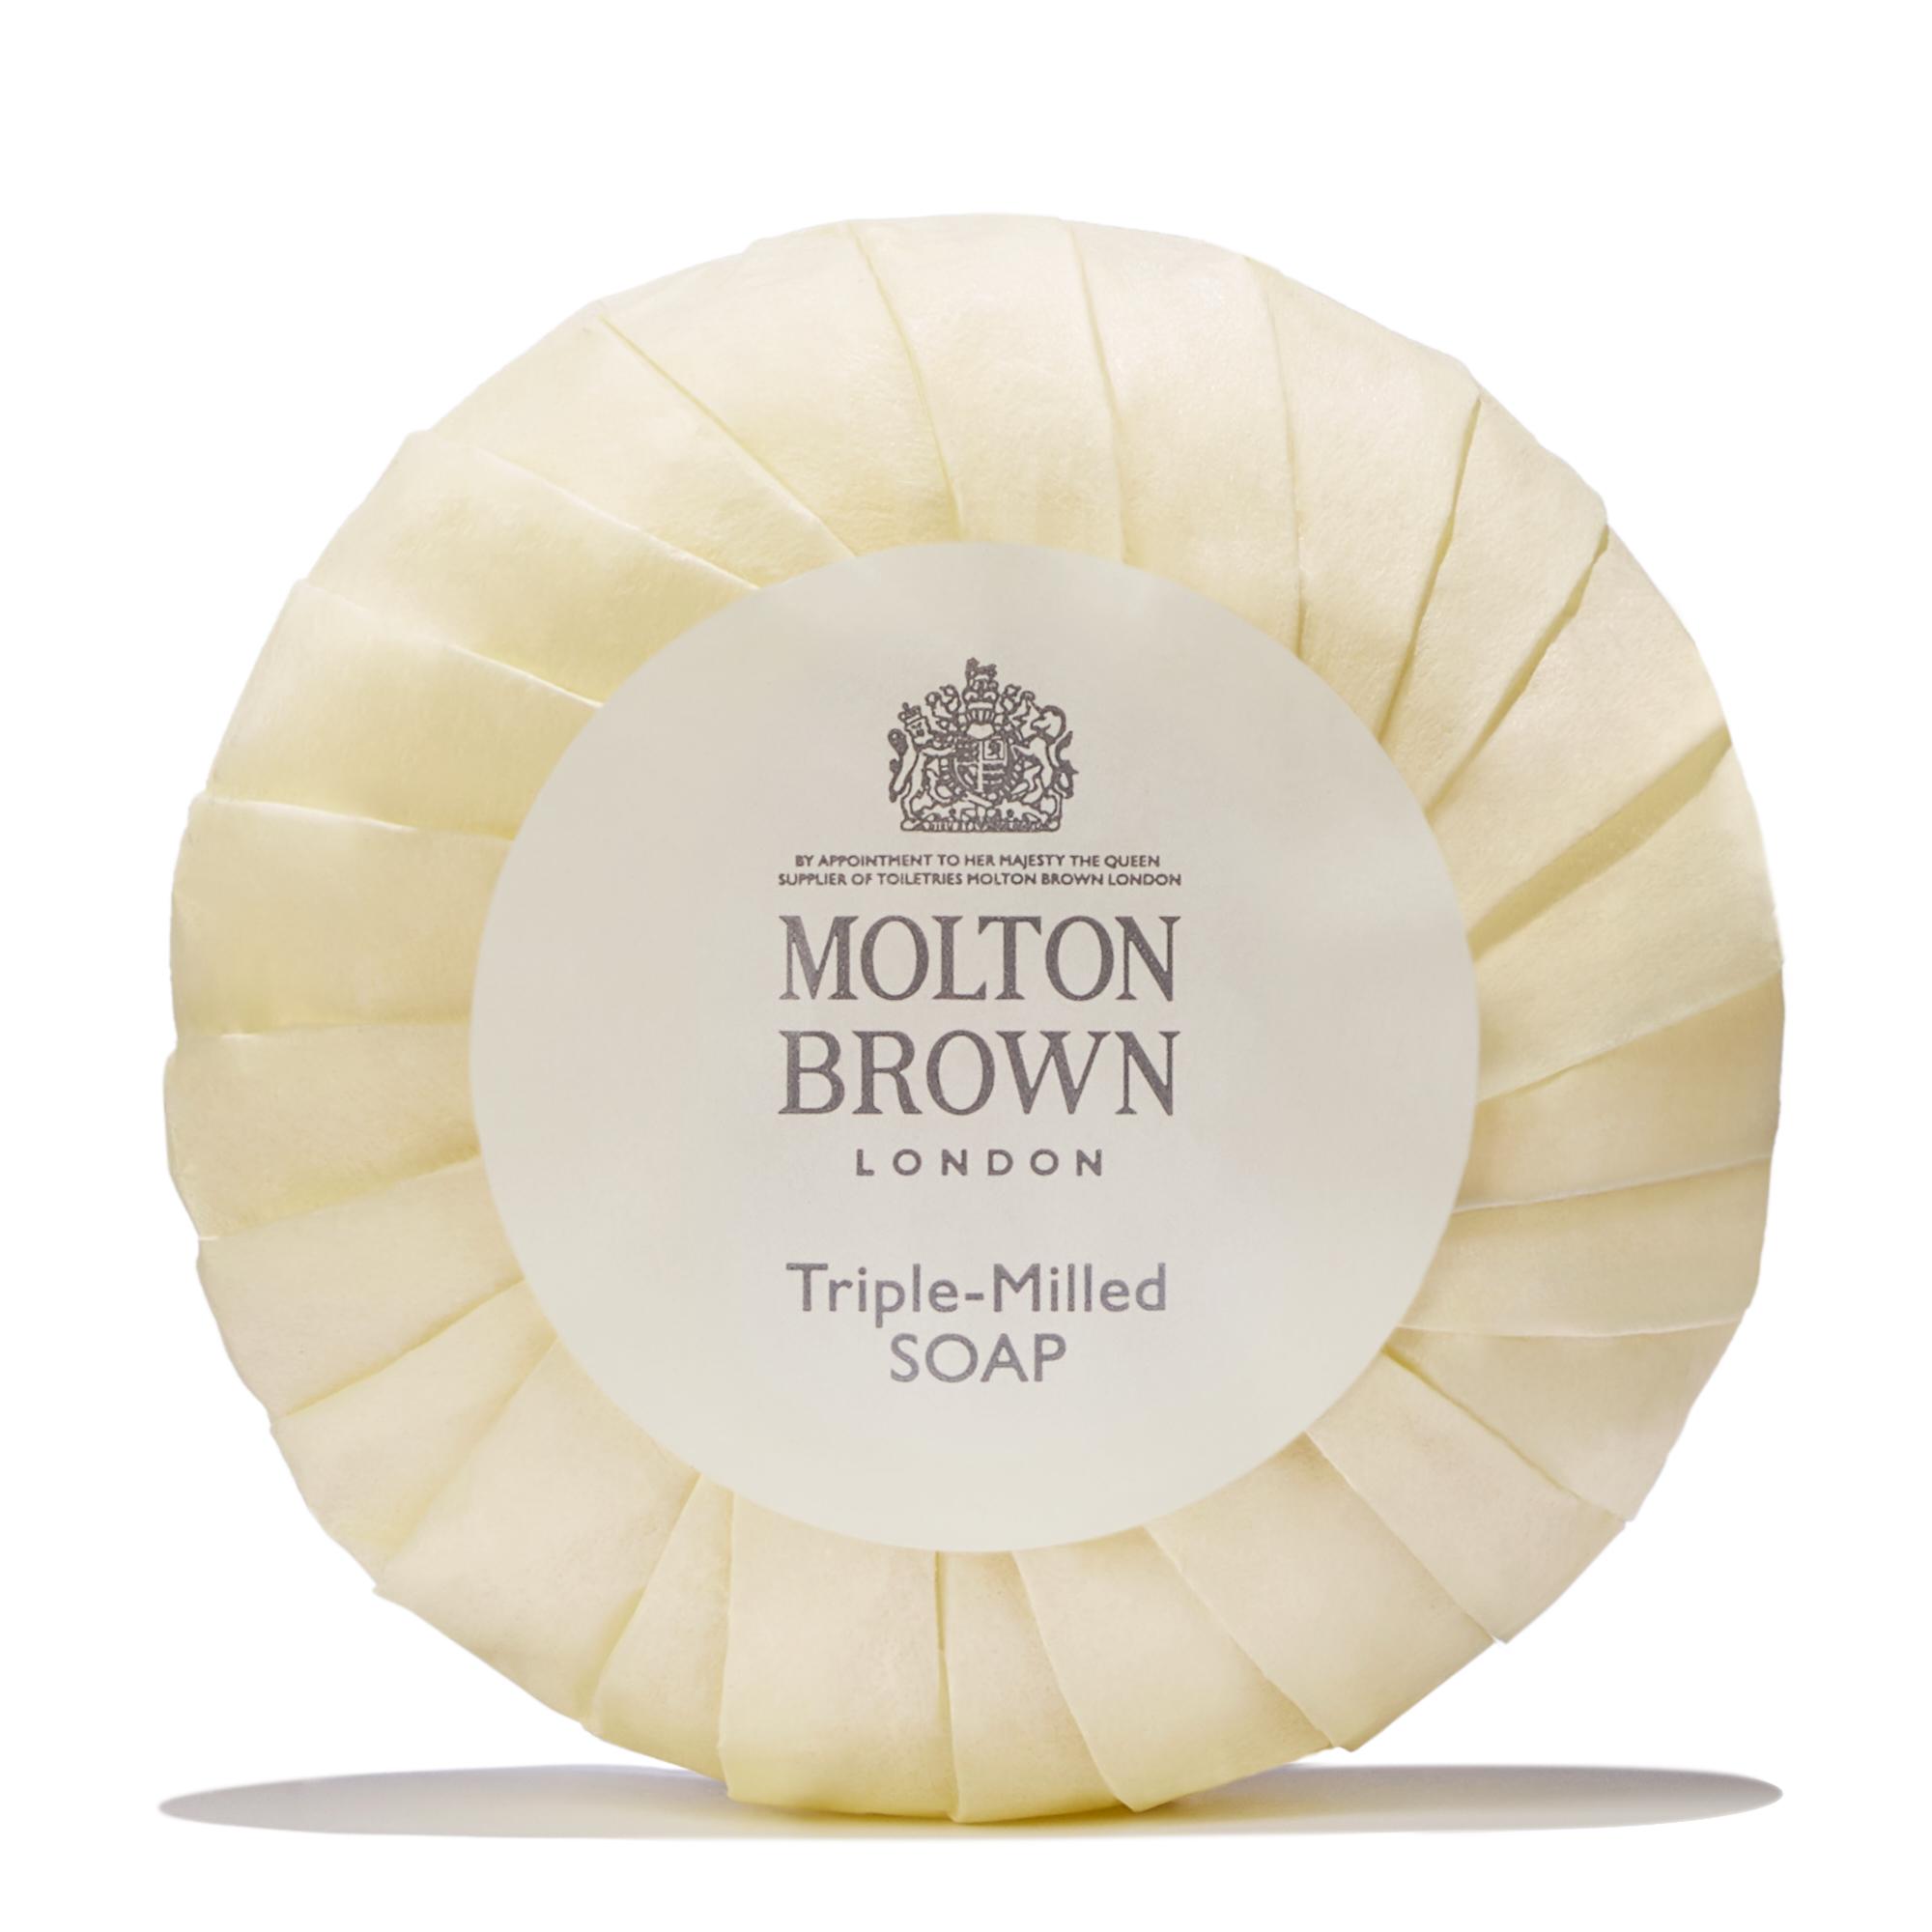 Molton Brown Ultra Pure Milk Wrapped Soap 50g